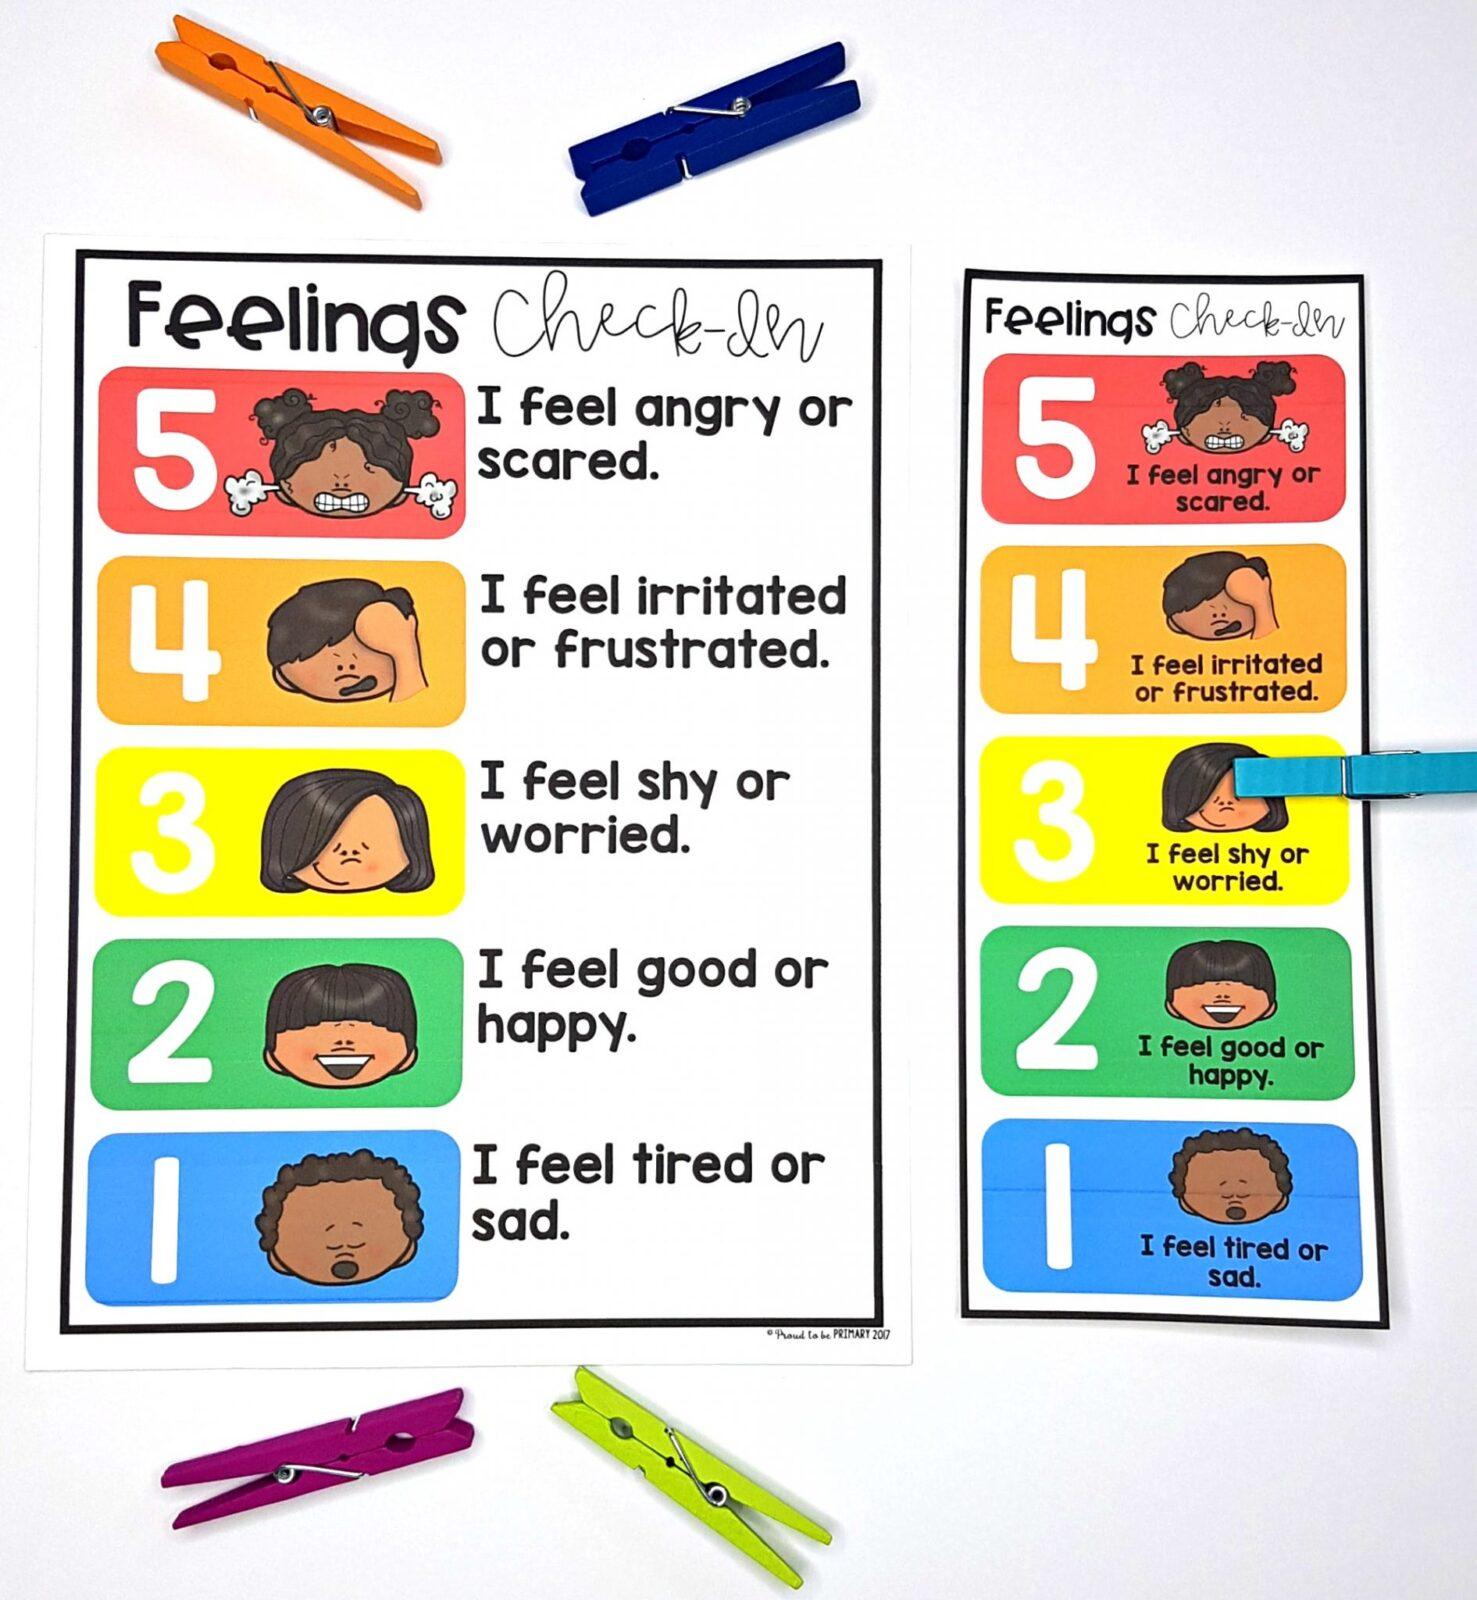 self-regulation strategies - feelings clip chart activity to help kids self-regulate their emotions